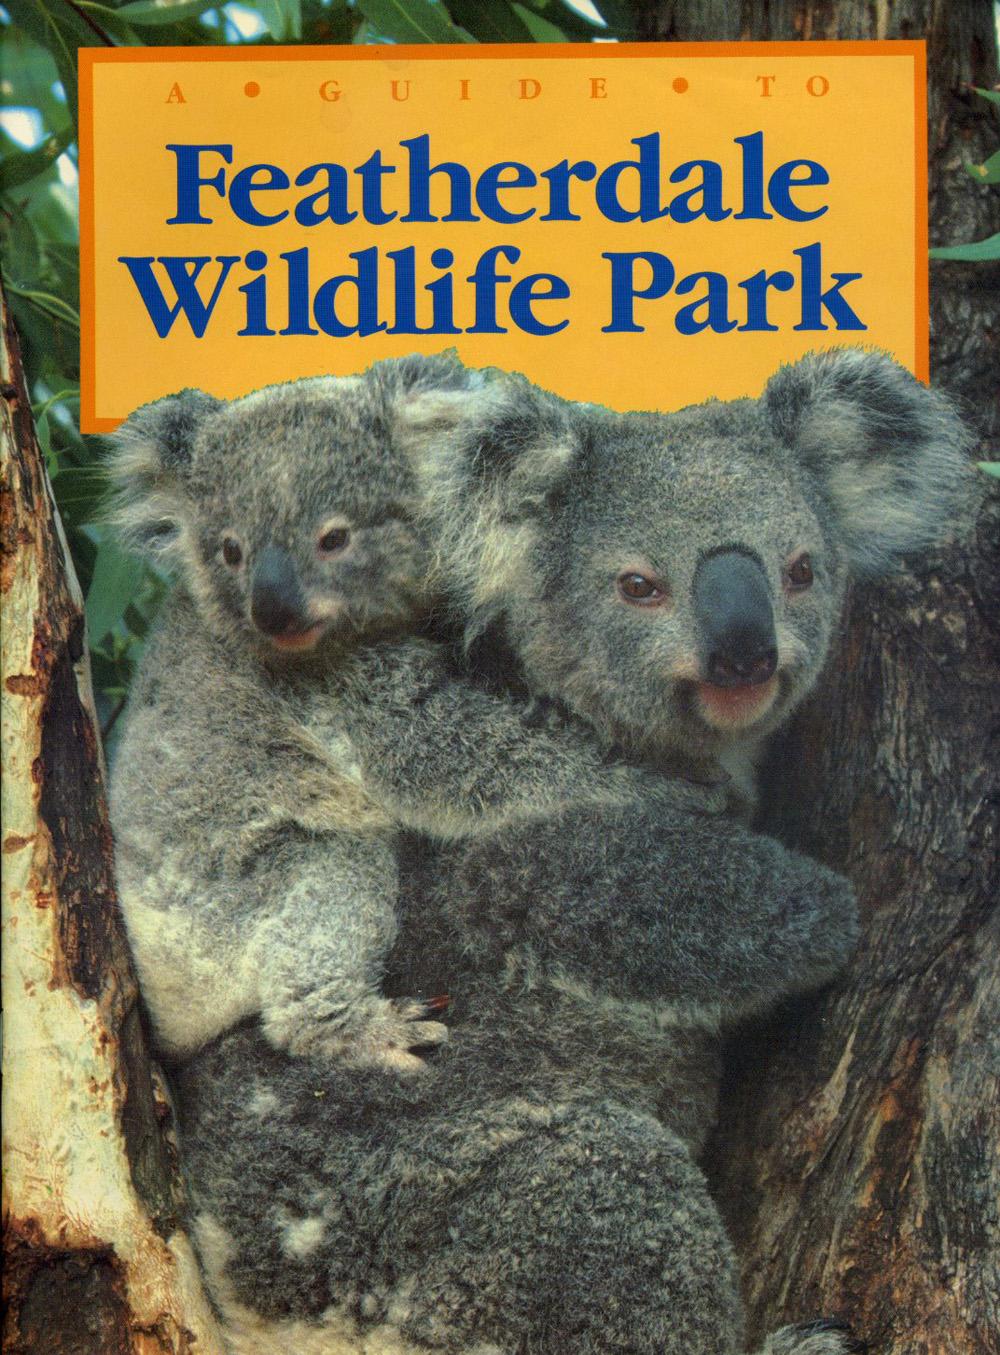 Featherdale wildlife park coupon 2018